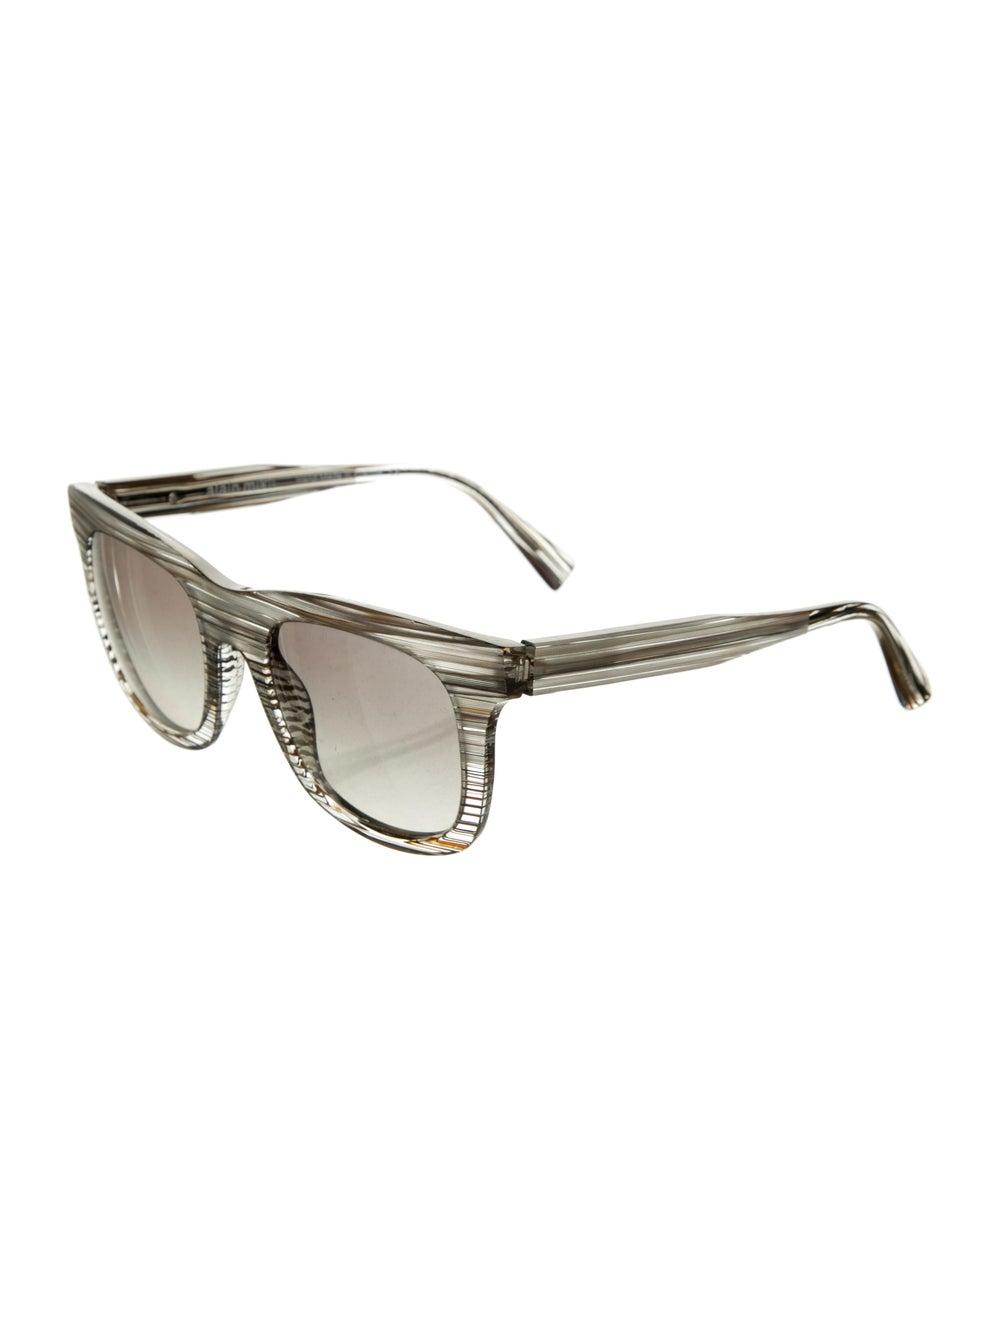 Alain Mikli Tinted Wayfarer Sunglasses Grey - image 2